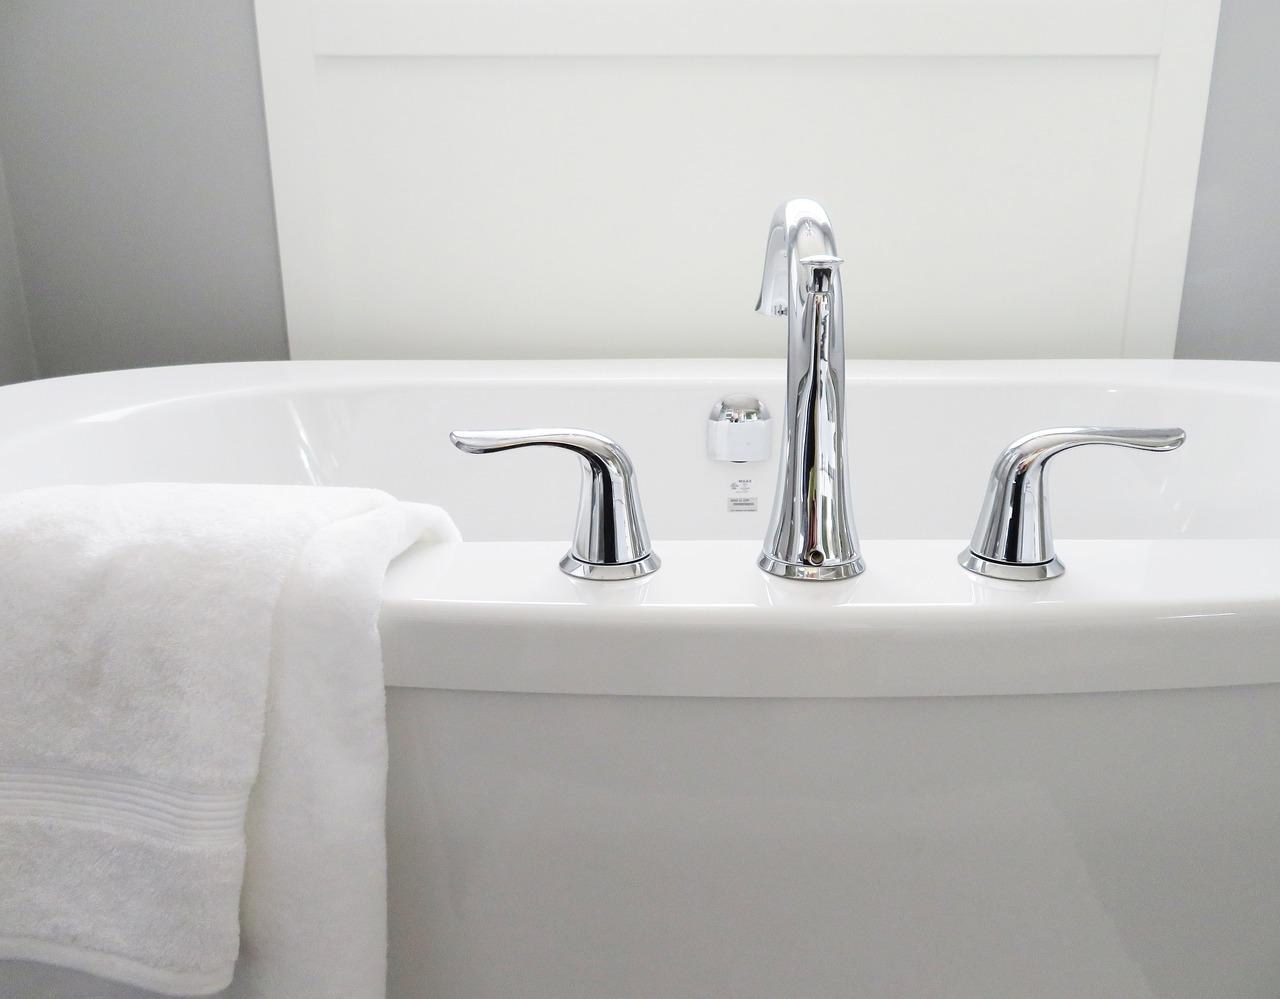 Altezza Vasca Da Bagno Incasso : Vasca da bagno metallo vasche bagno barocche rinascimentali